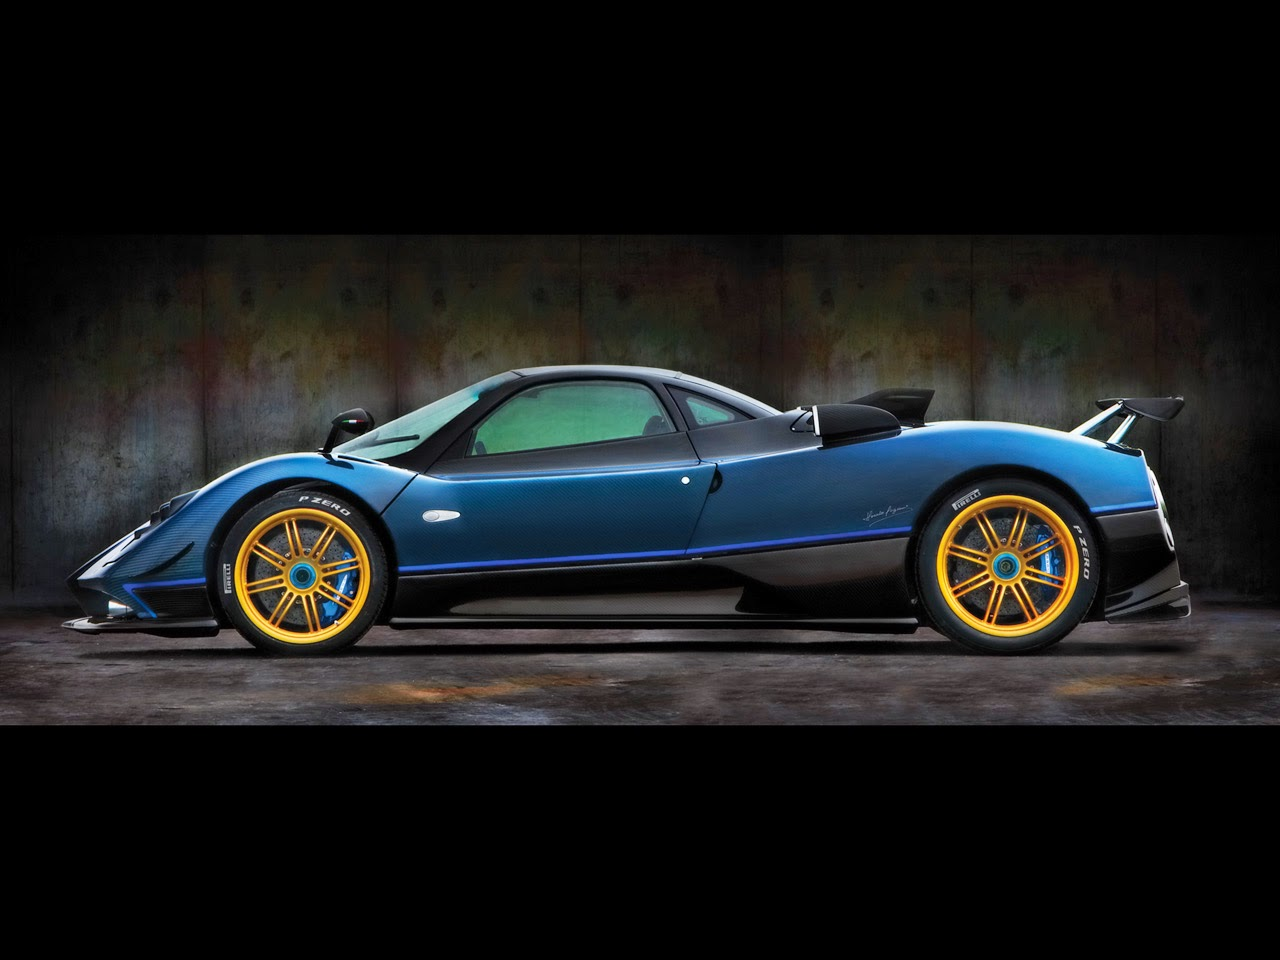 Sport Cars Wallpaper For Iphone 7: 10+ 3D Wallpapers Car Sport Desktop Download Free Best Top